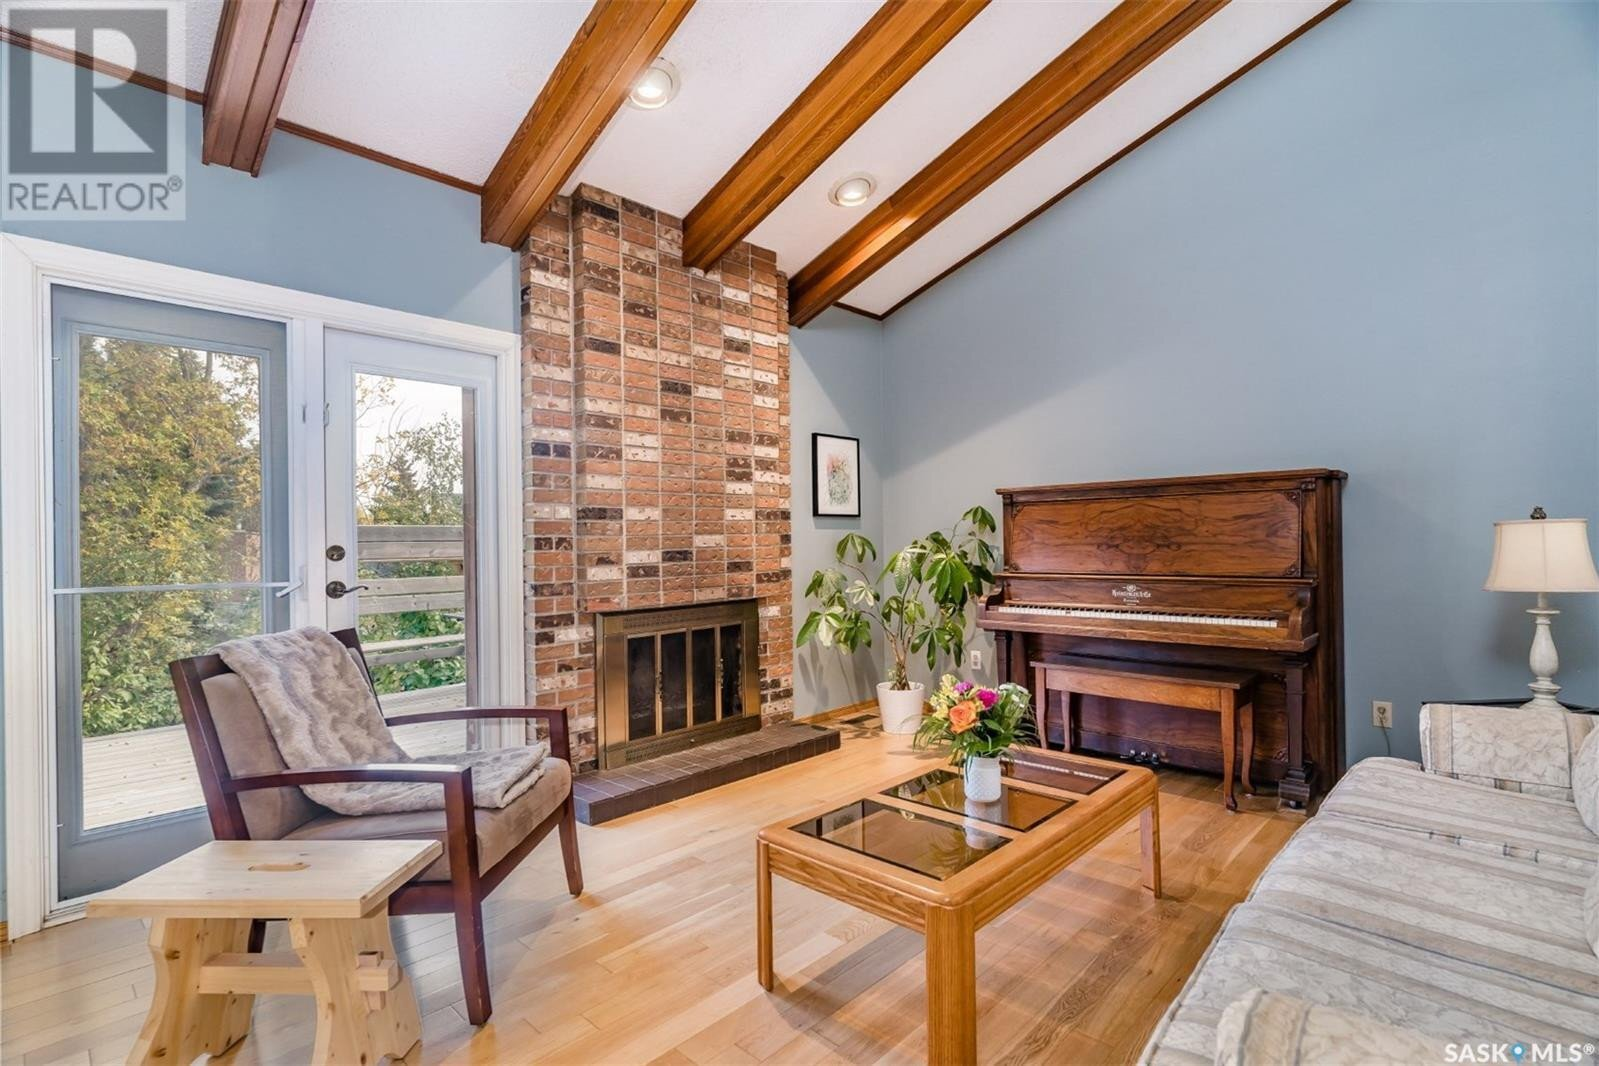 House for sale at 114 Penryn Cres W Saskatoon Saskatchewan - MLS: SK833982